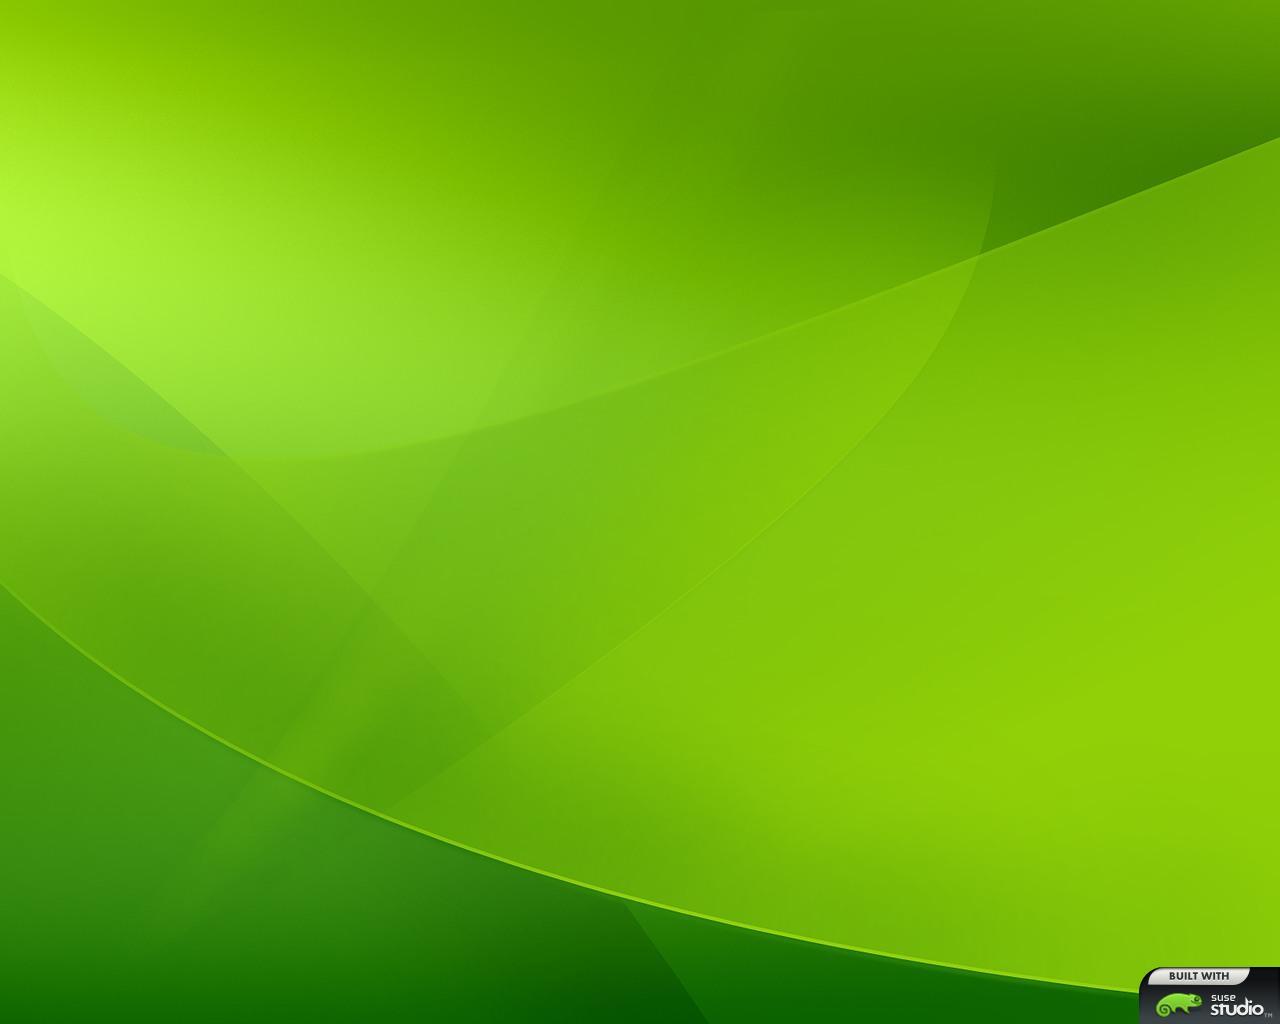 vifib.server/bootsource/root/etc/bootsplash/themes/SLED/images/silent-1280x1024.jpg